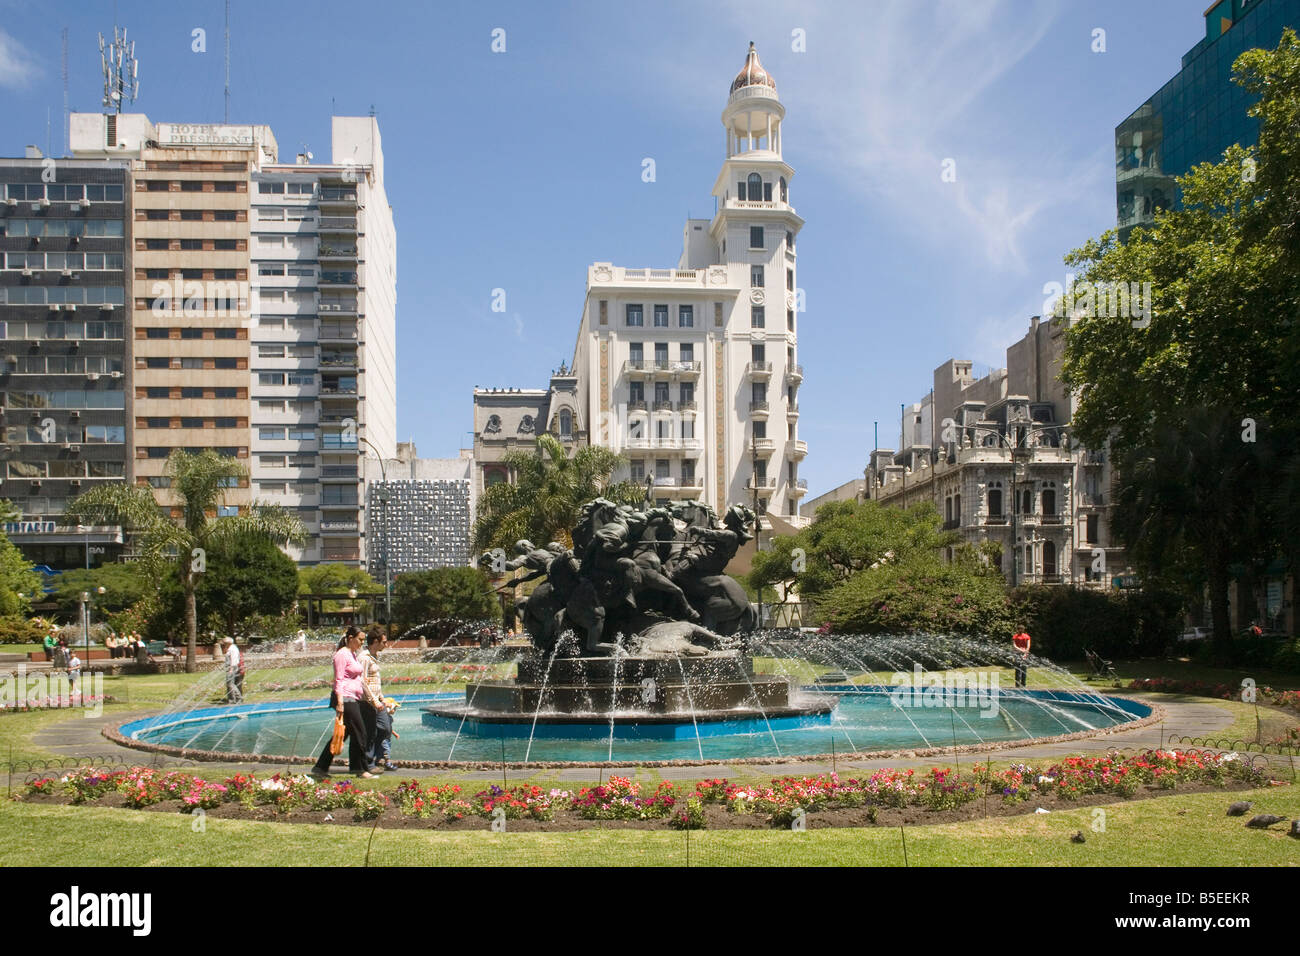 Plaza Fabini Montevideo Uruguay South America - Stock Image